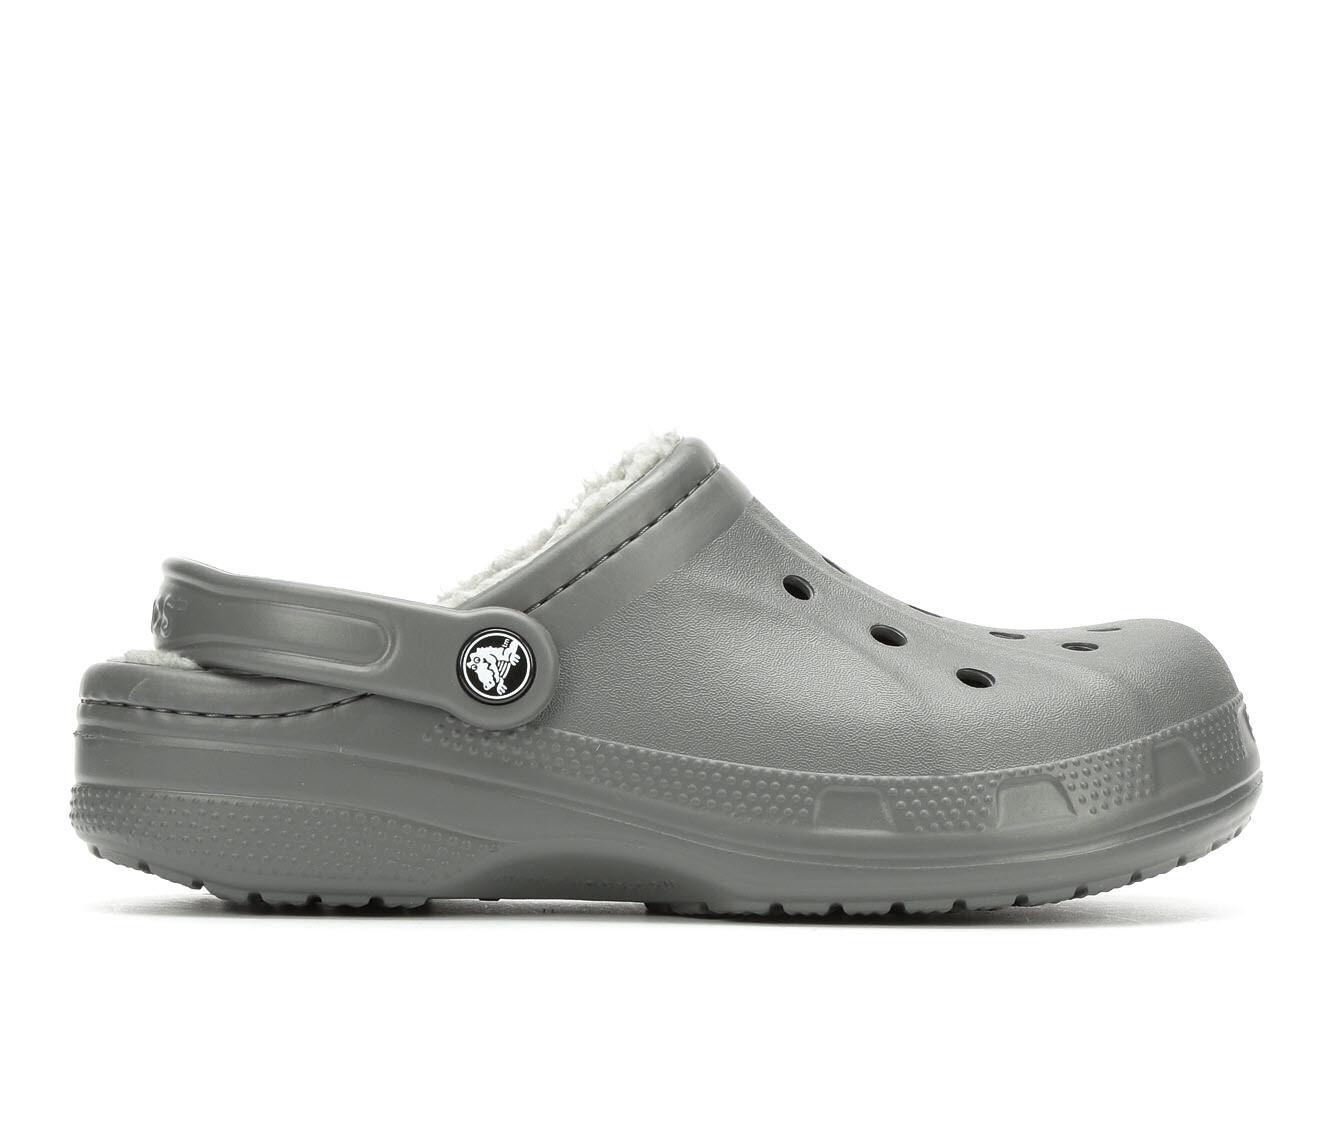 06a3305ad42fcd Adults crocs winter clog shoe carnival jpg 1694x1436 Crocs women clog fur